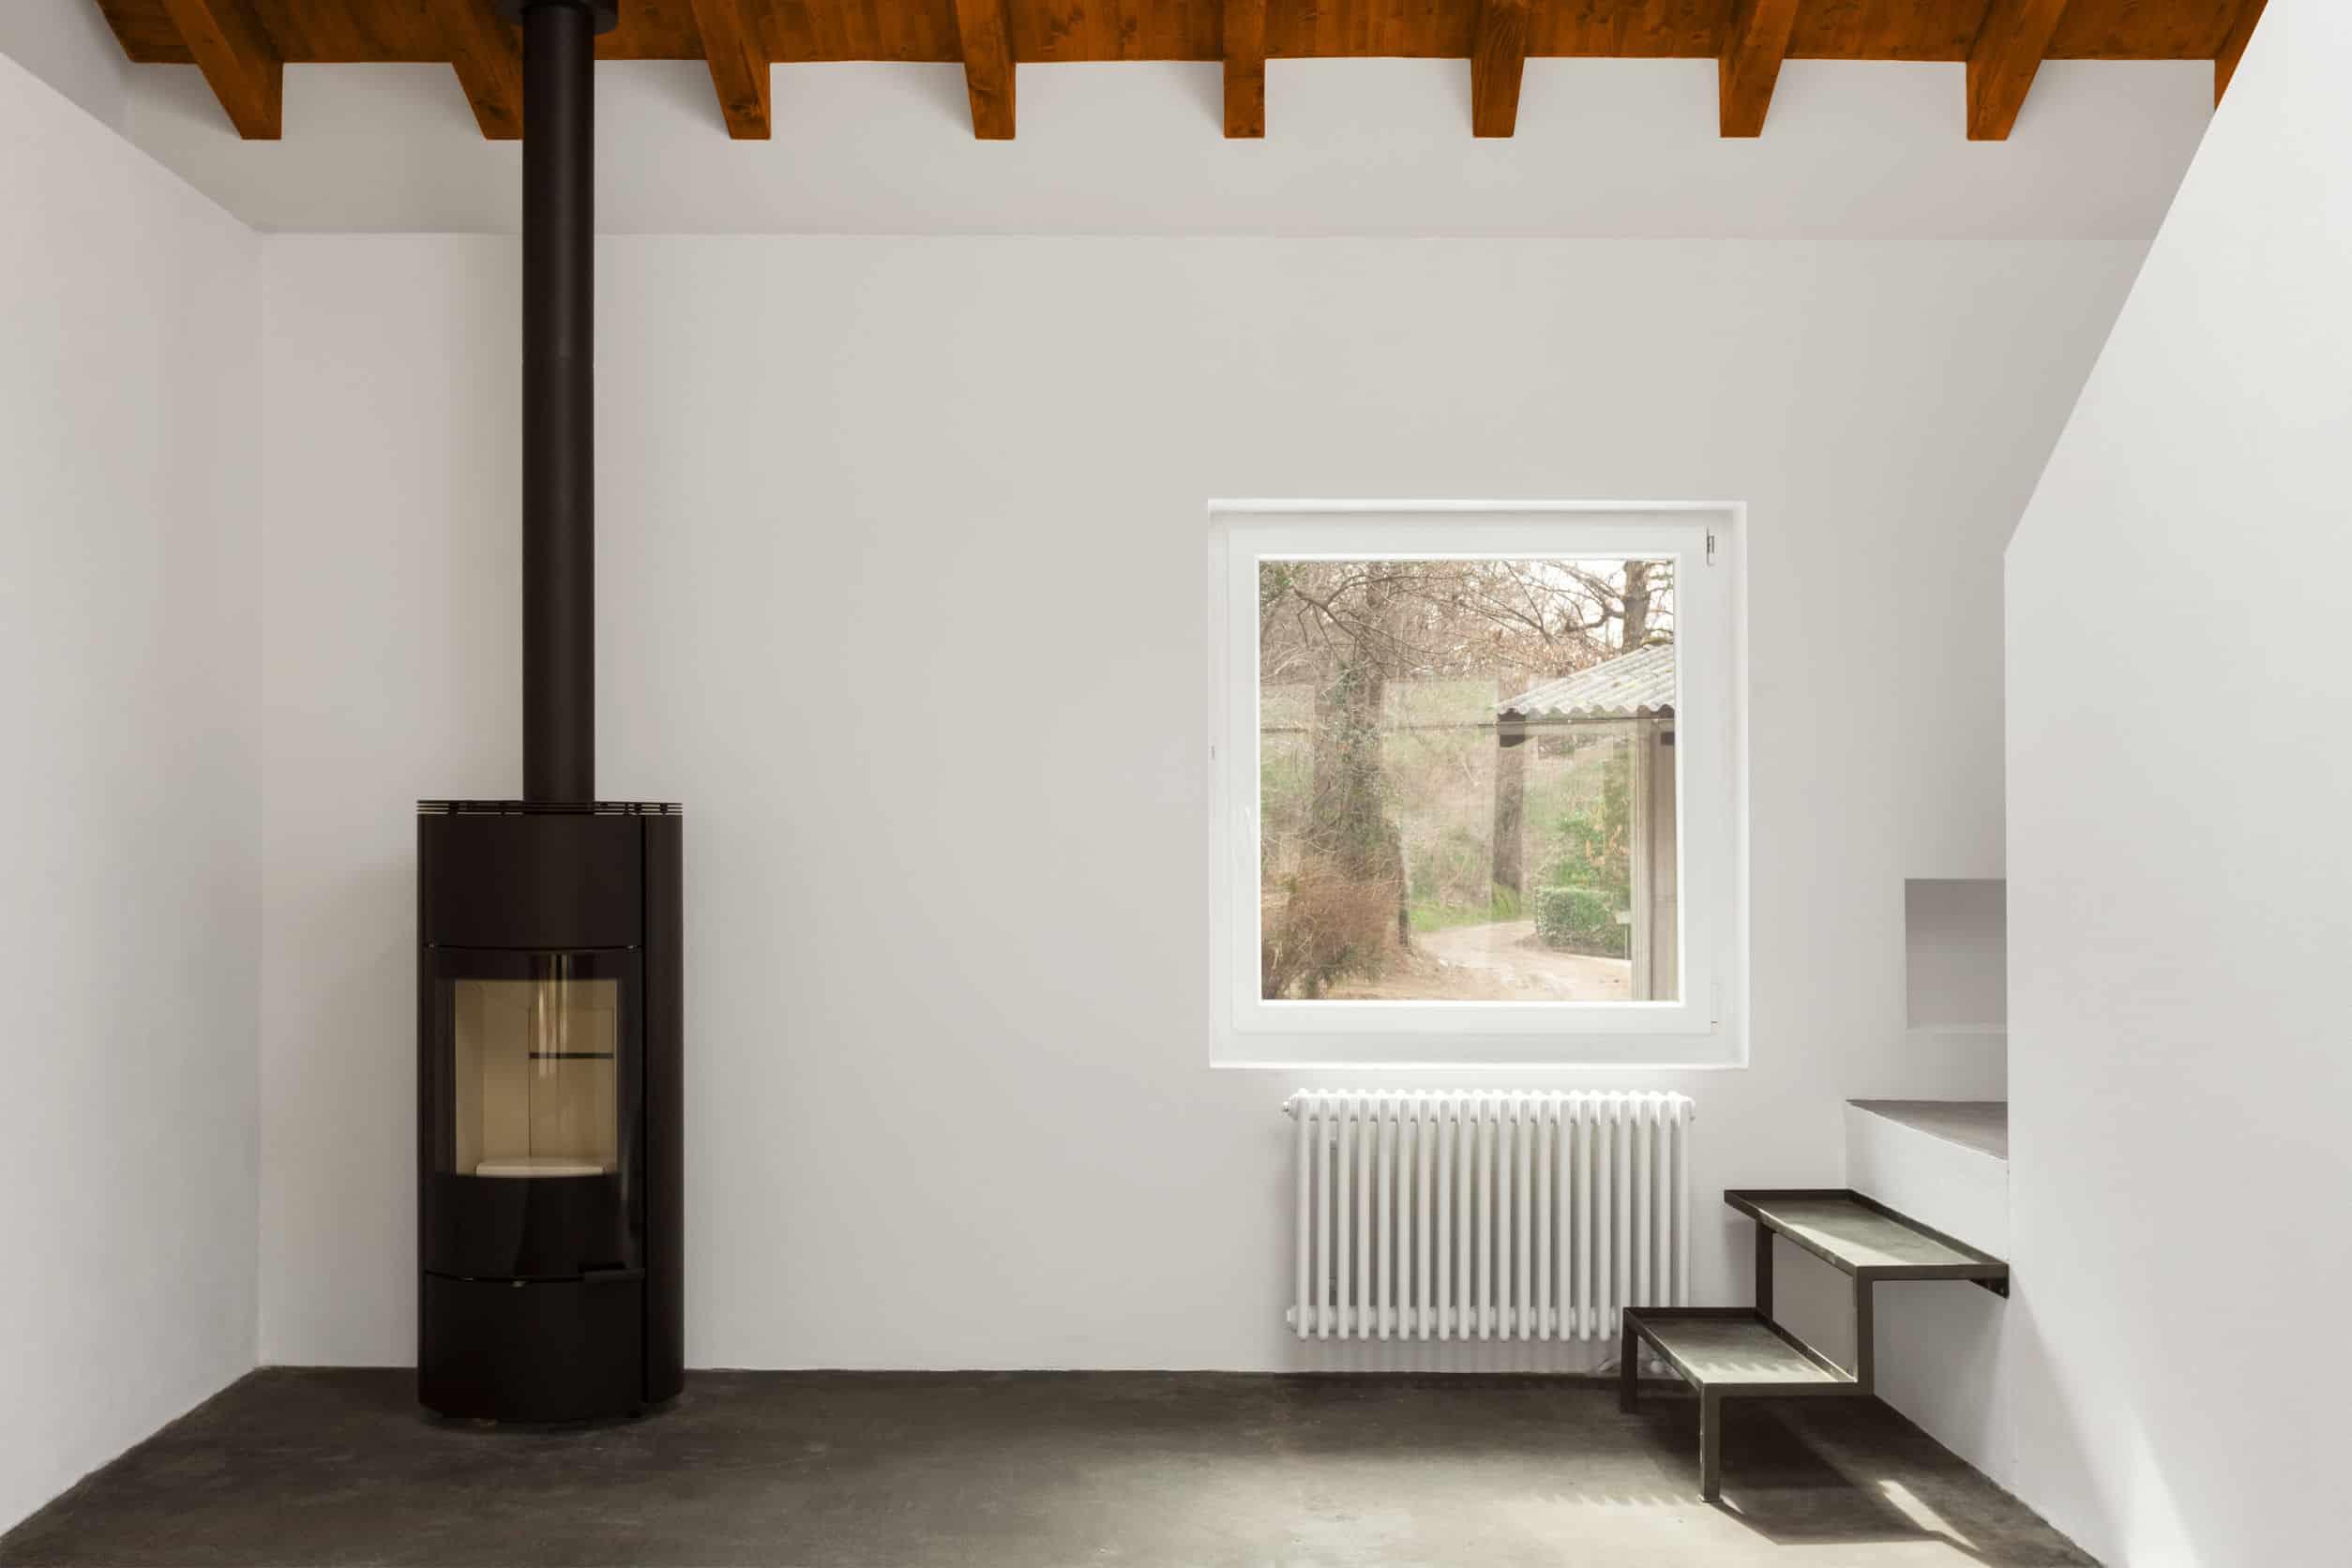 Architectuurinterieurs, modern huis